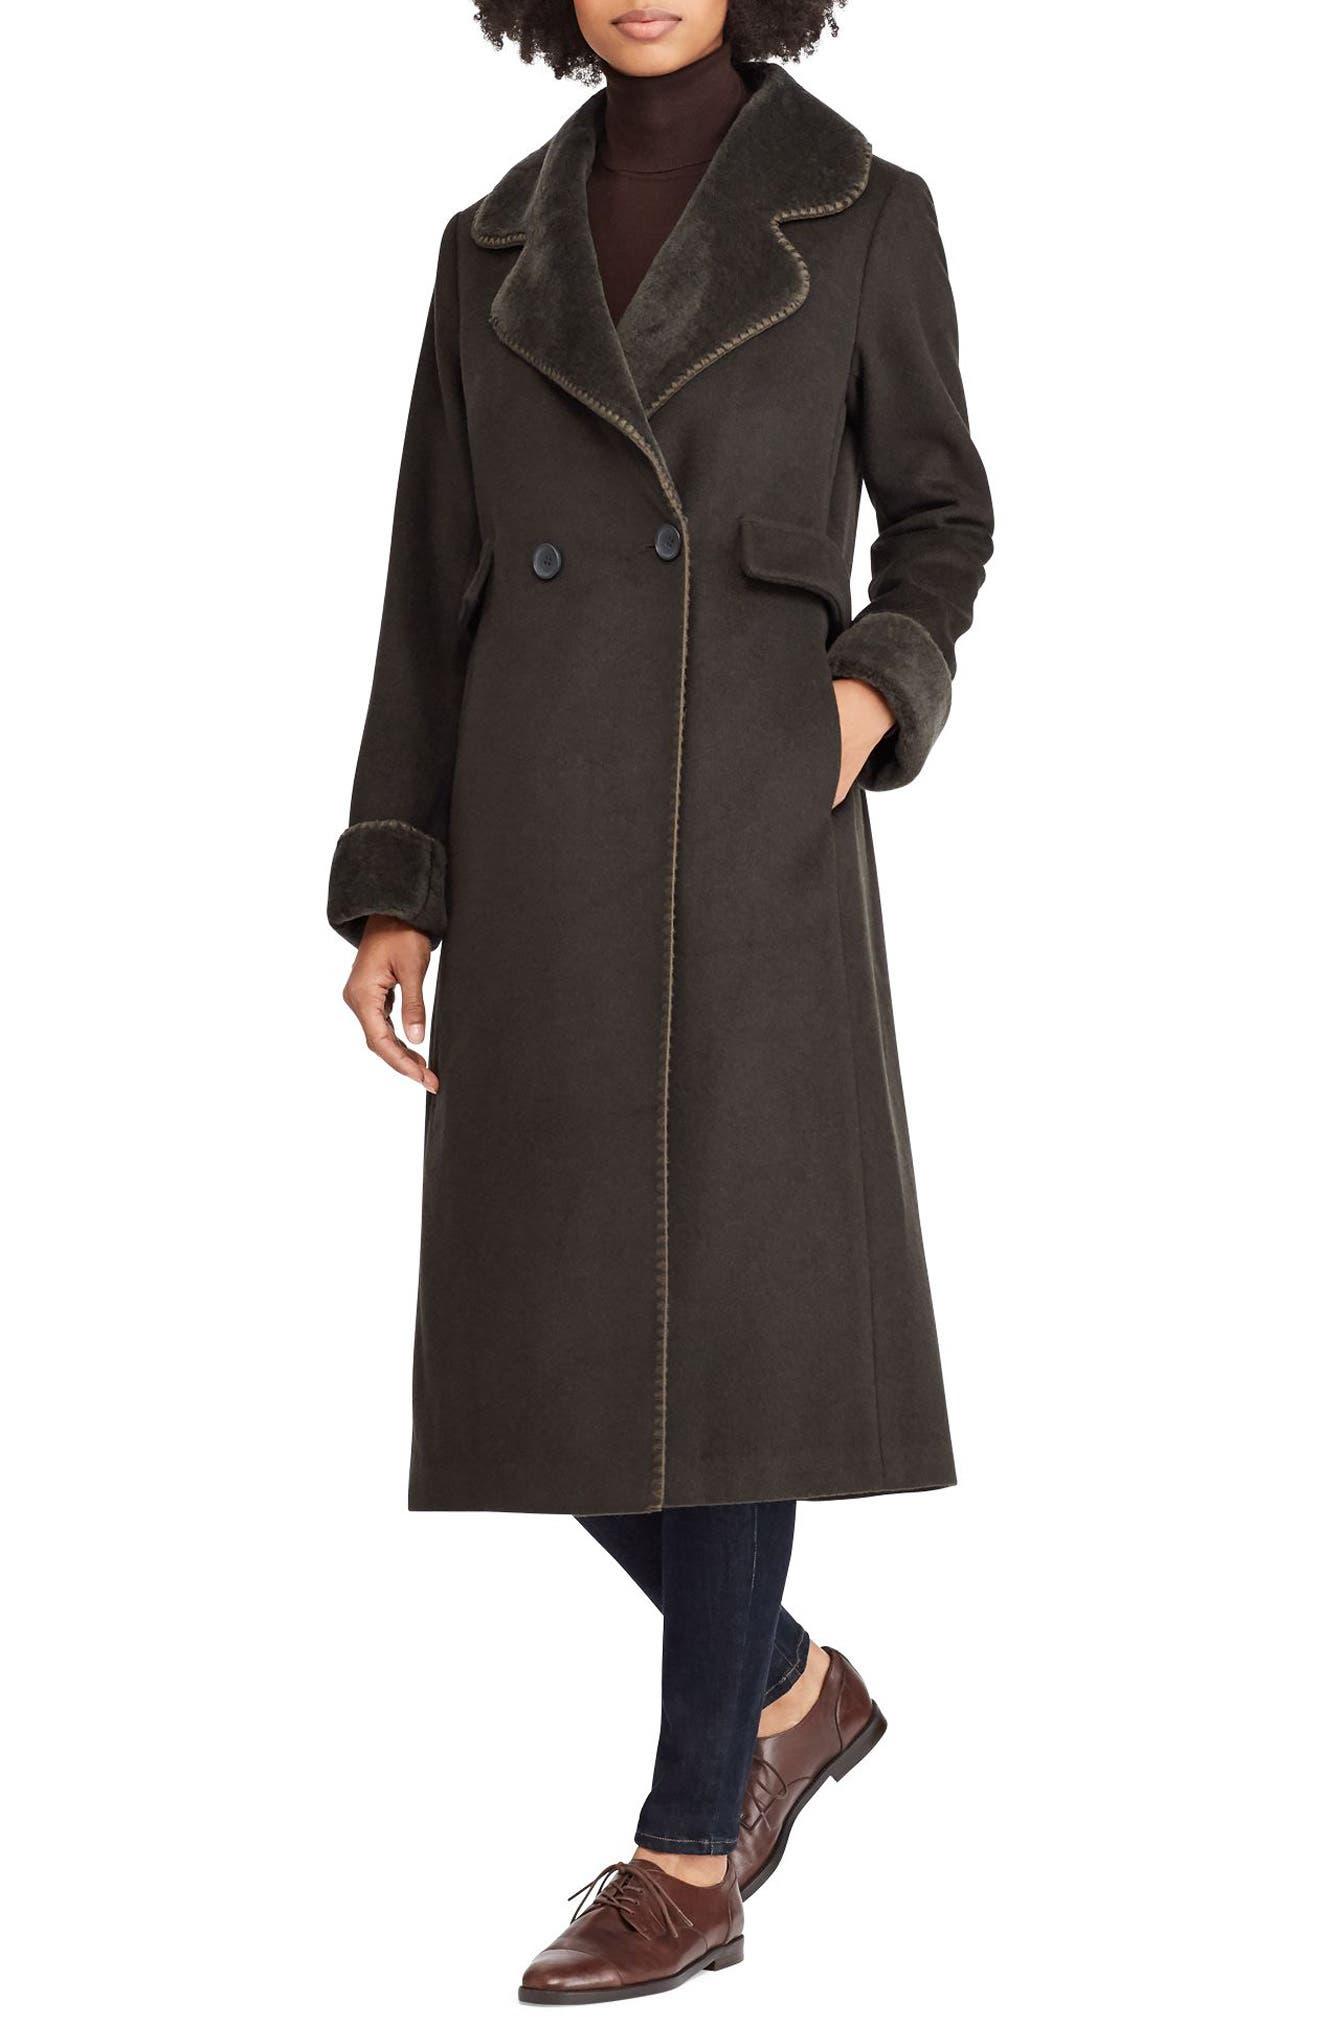 Wool Blend Faux Shearling Trim Coat,                         Main,                         color, MILITARY GREEN